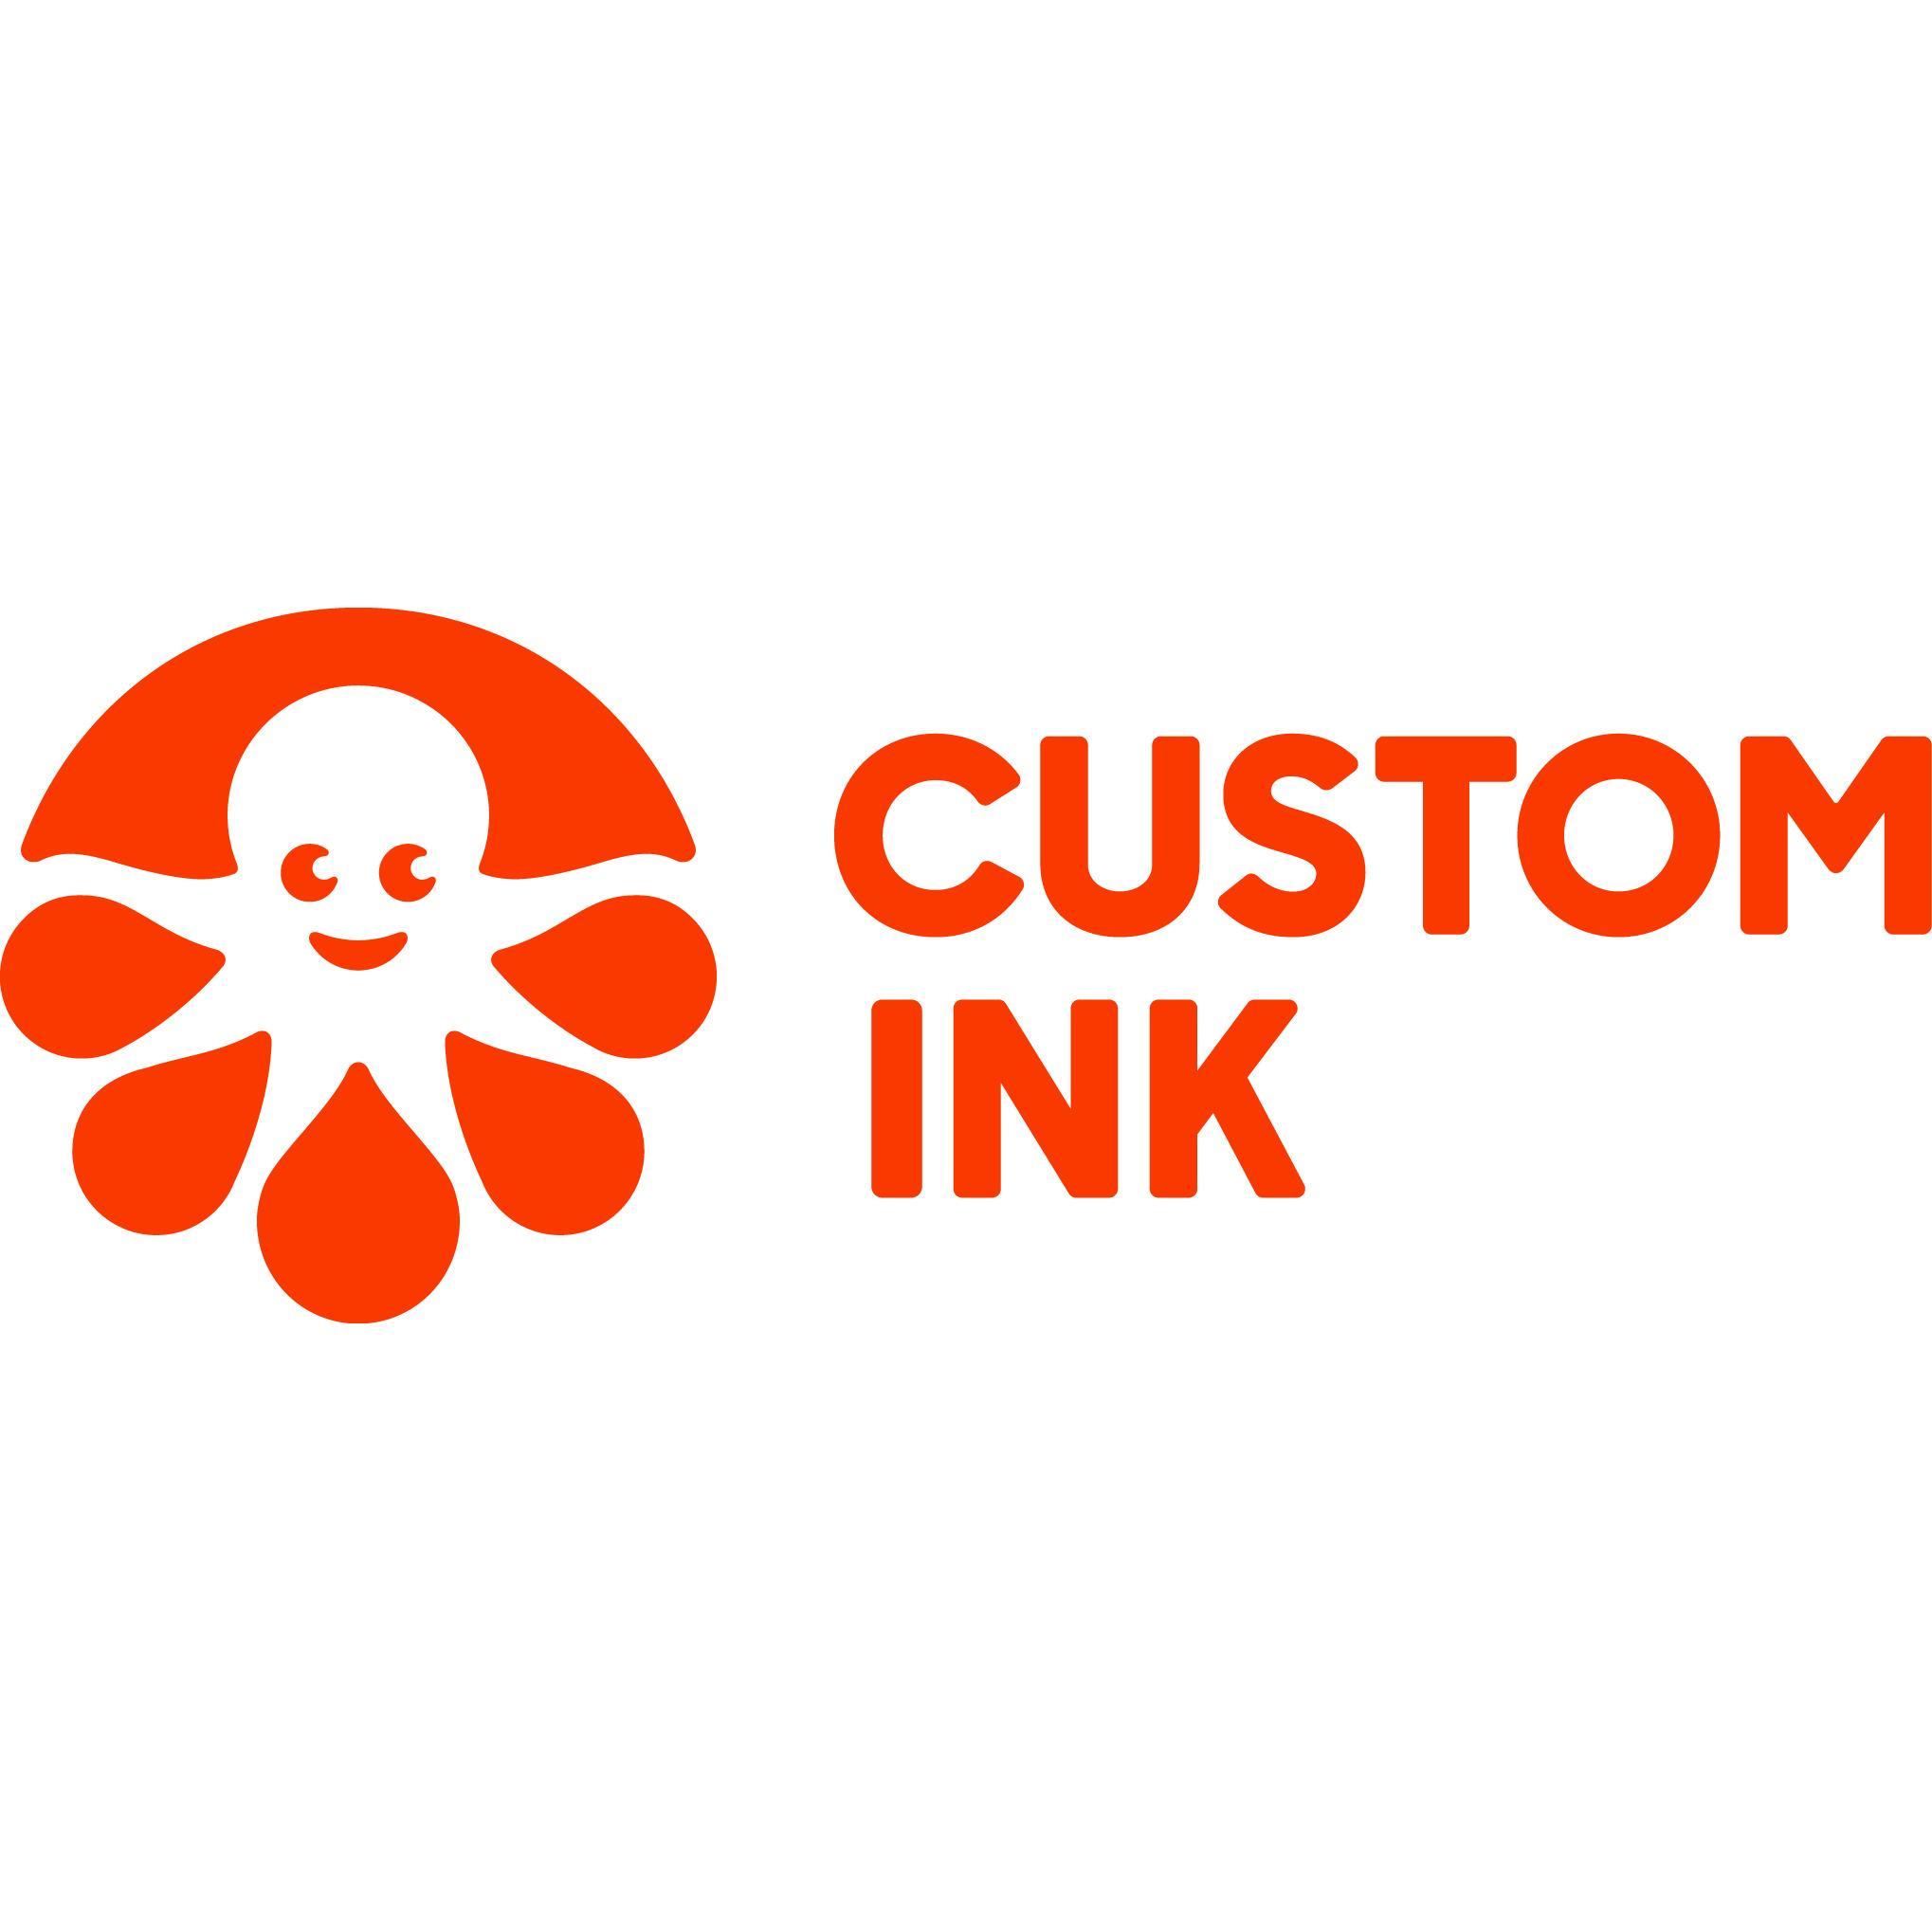 Custom Ink